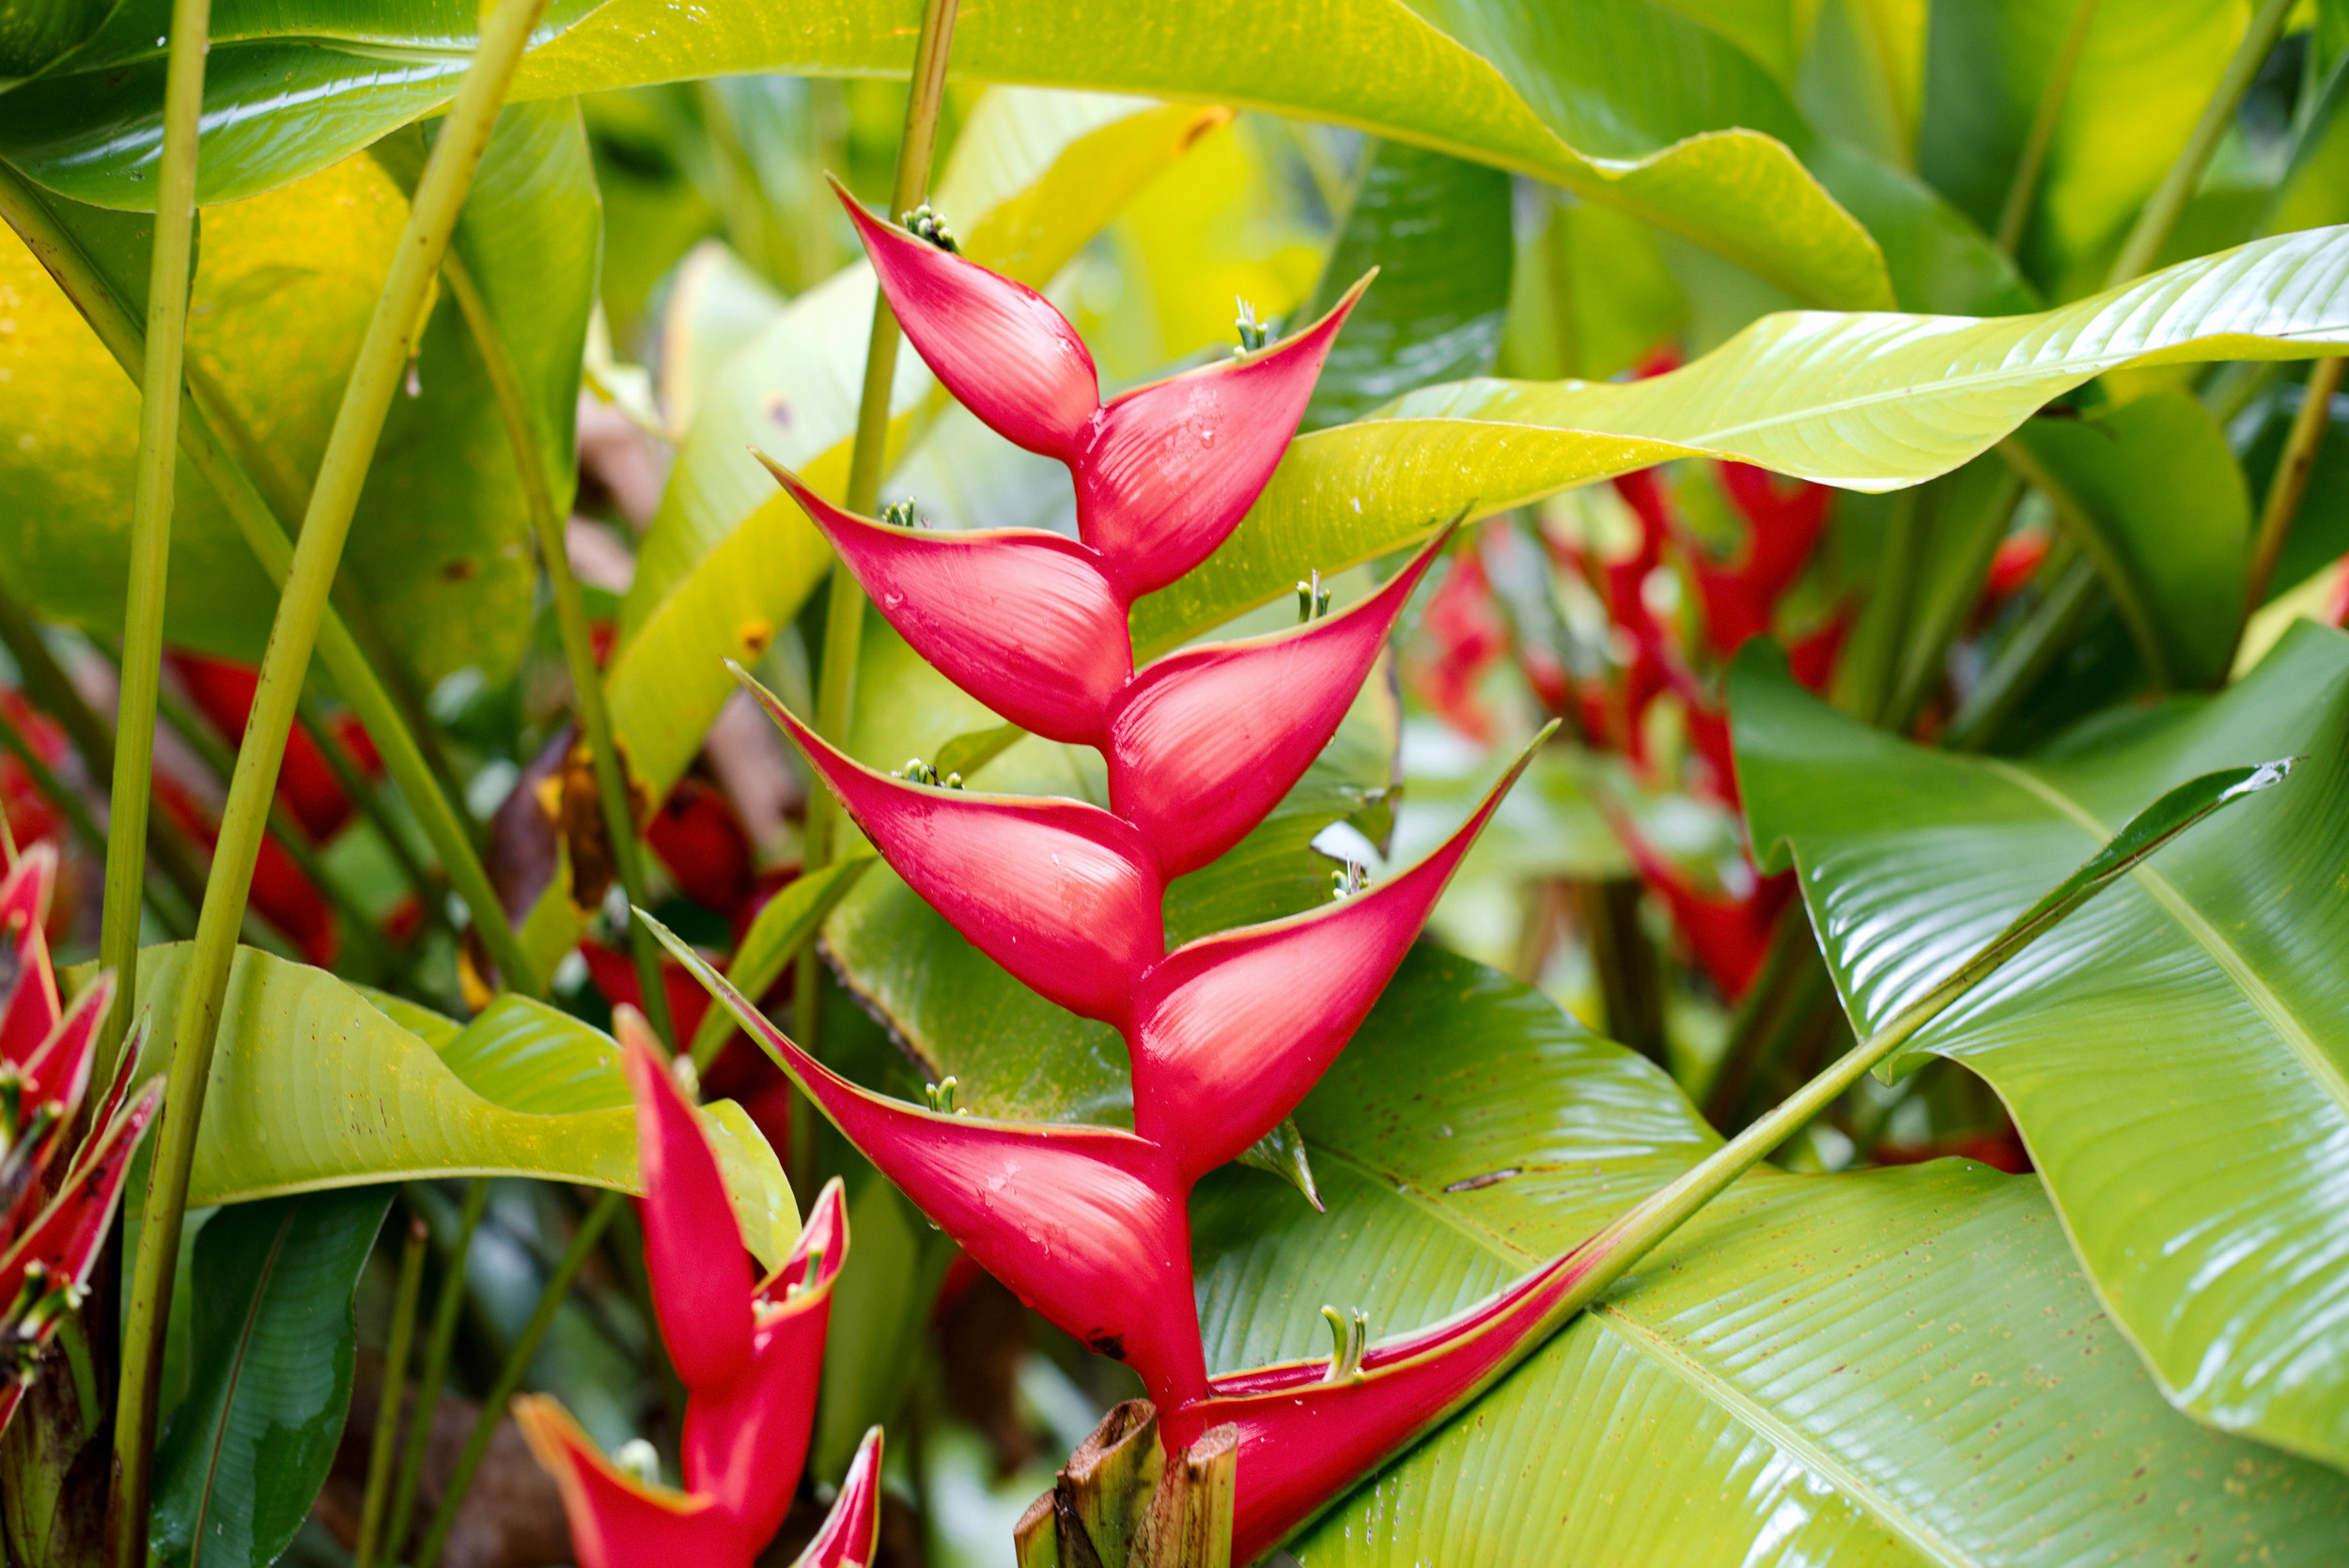 In the jungle, Palenque